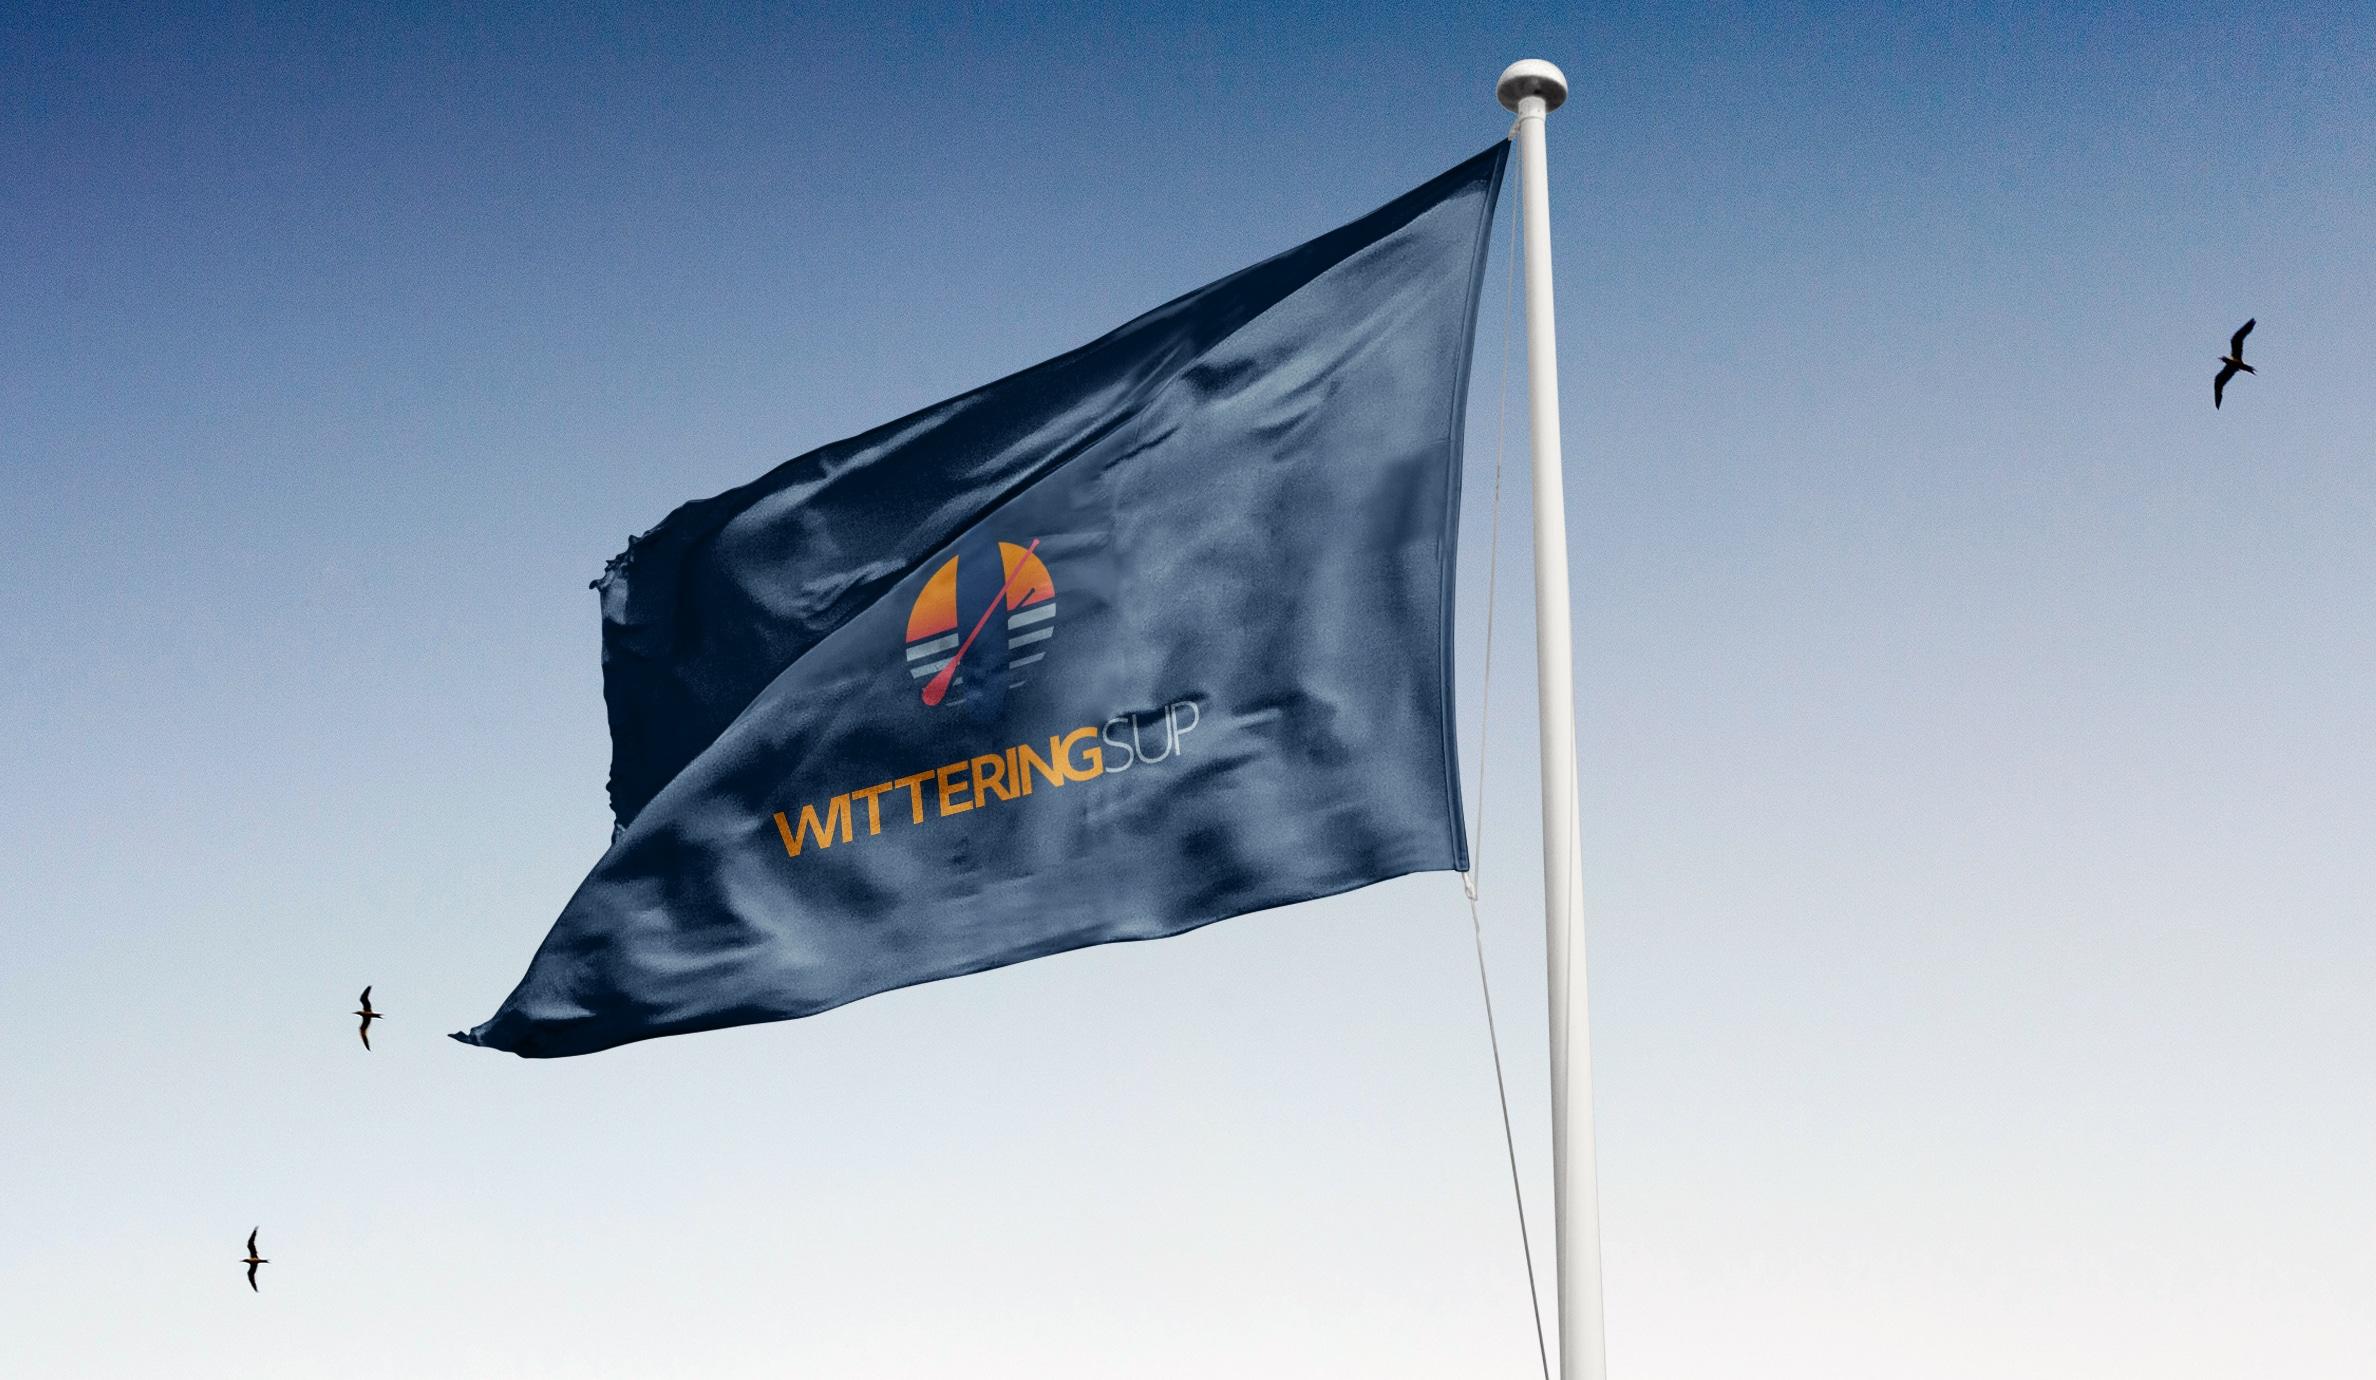 wittering sup branded merchandise dark blue flag with logo